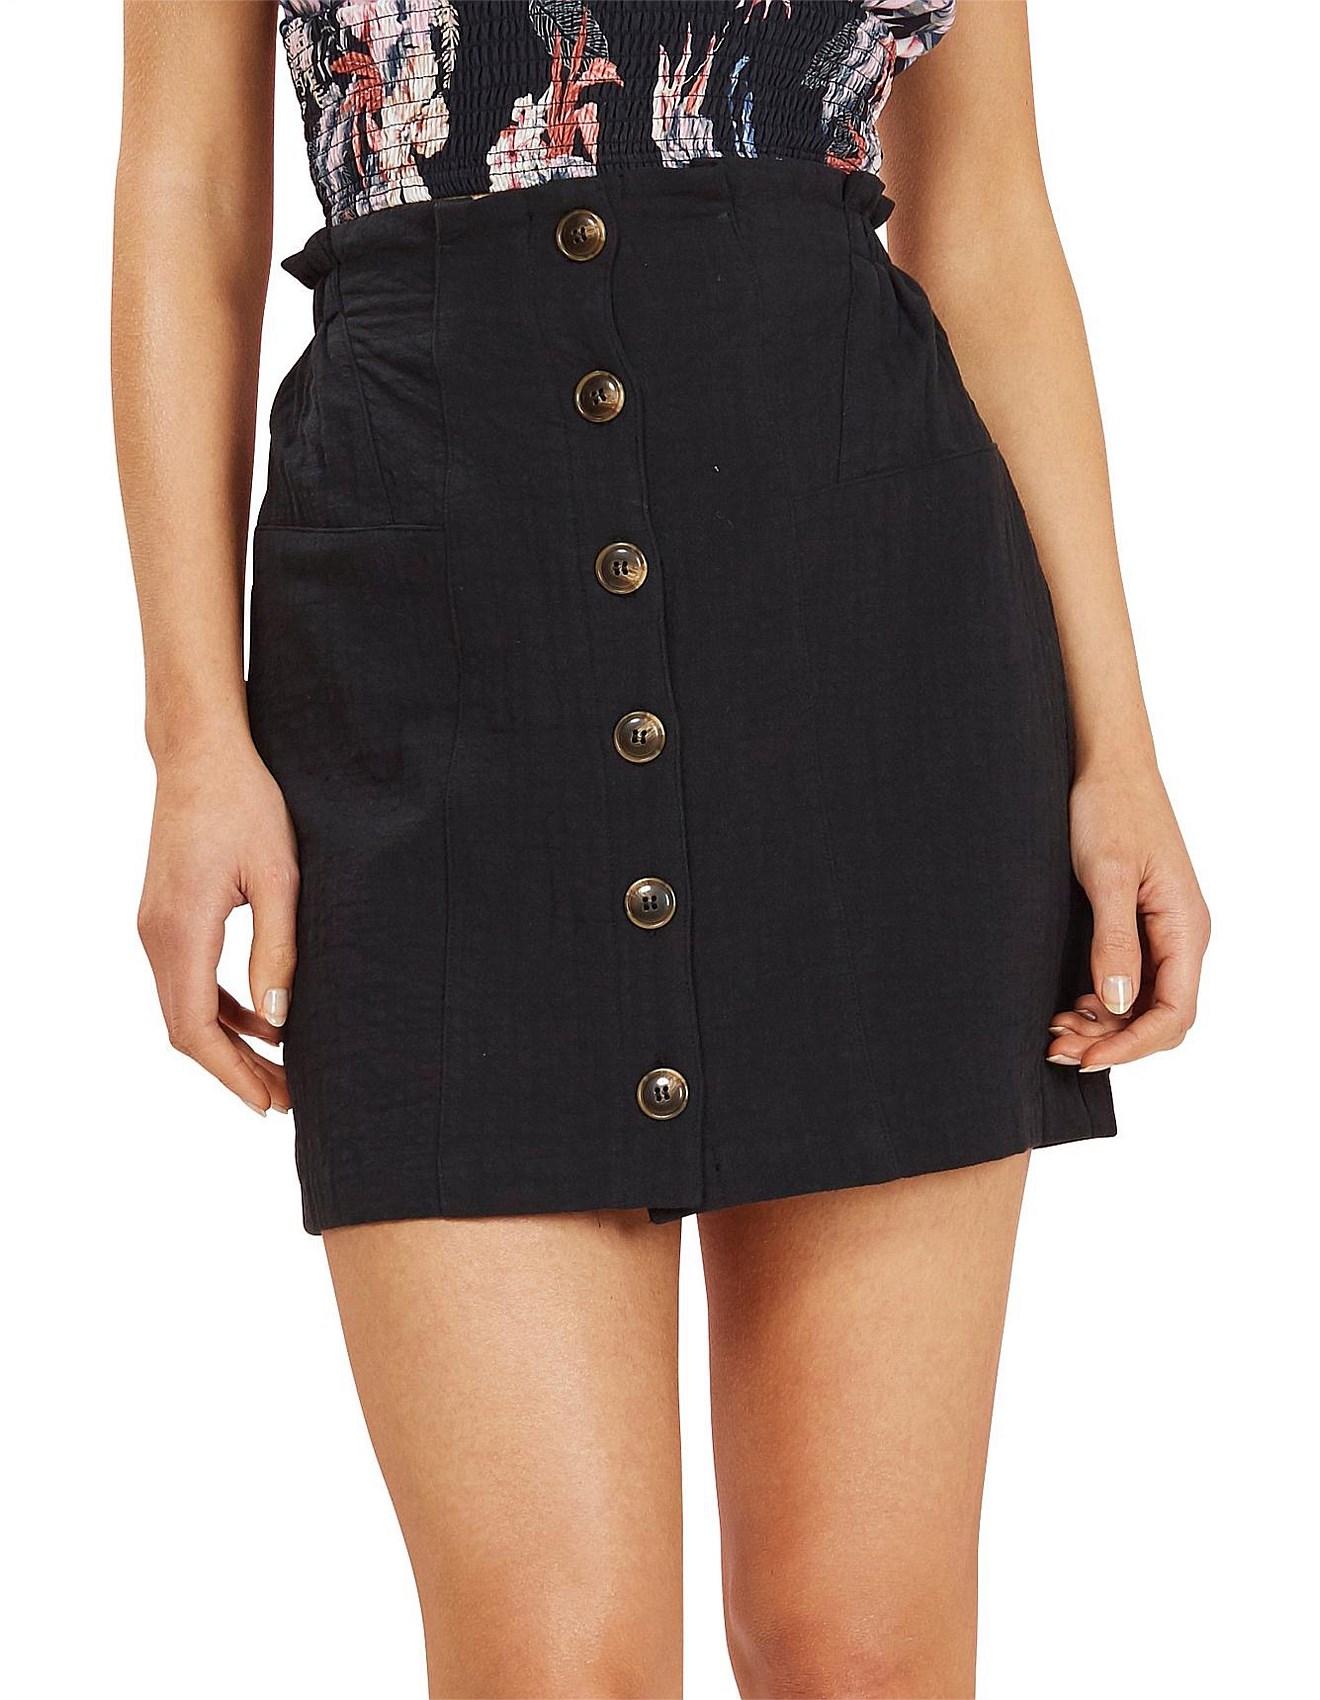 2b86cd04a4 Mini Skirts | Short Skirts & Mini Skirts Online | David Jones - MILA BUTTON UP  SKIRT